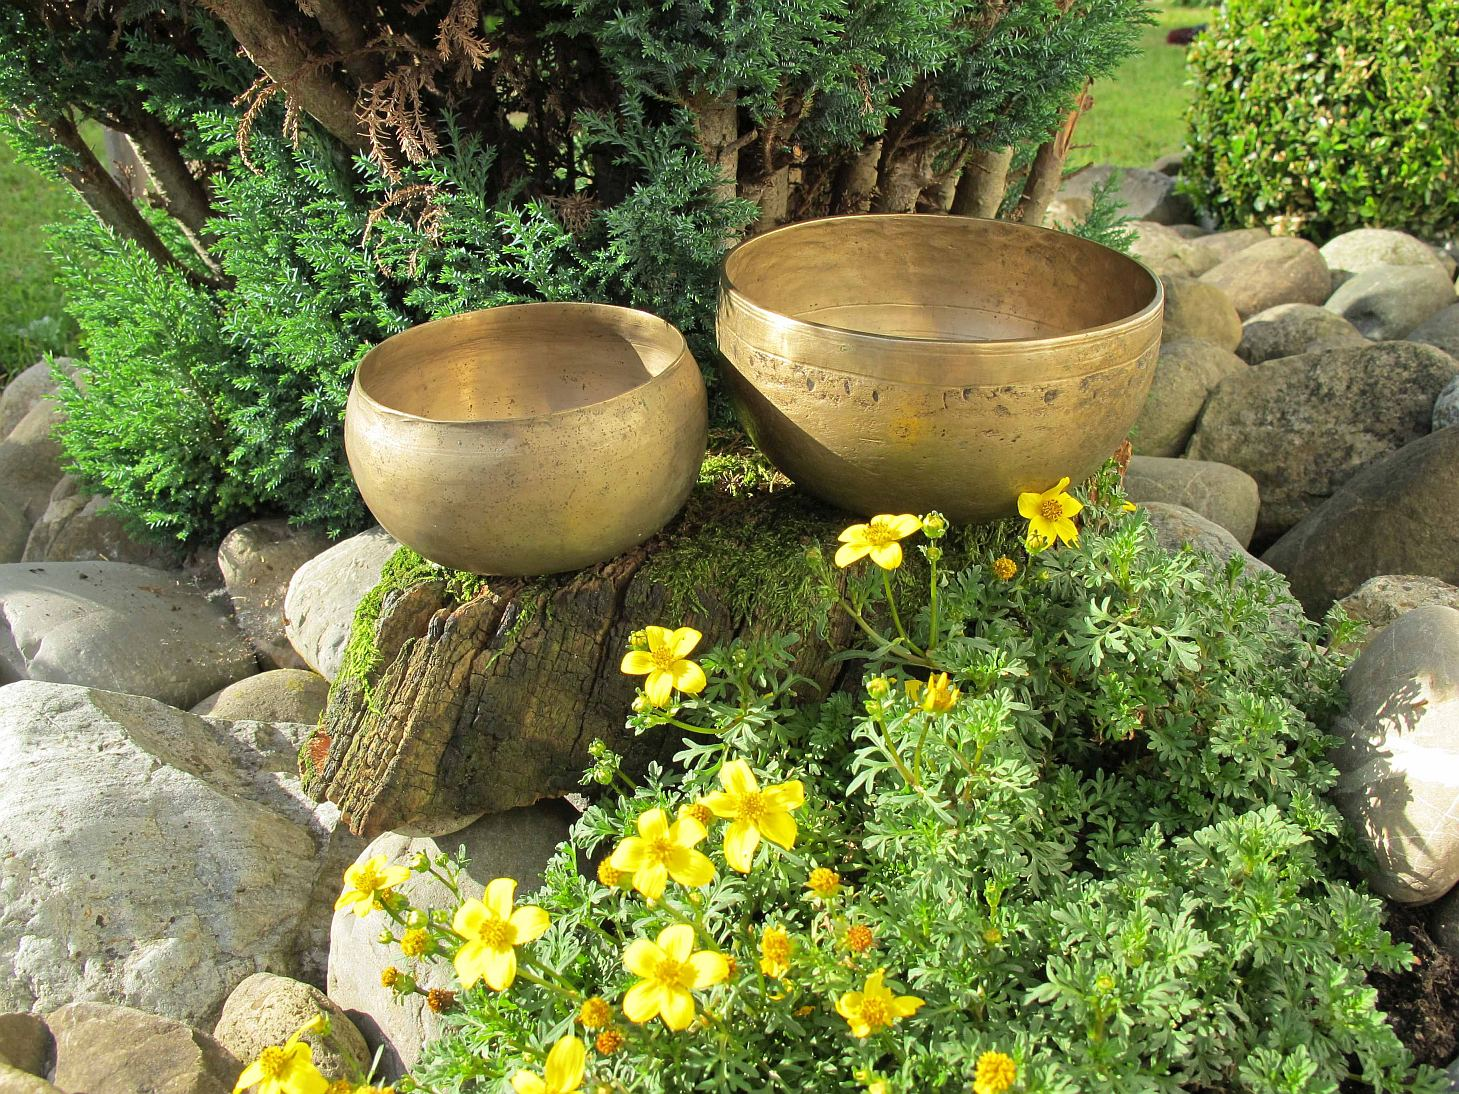 Tibet Yak-Bowls